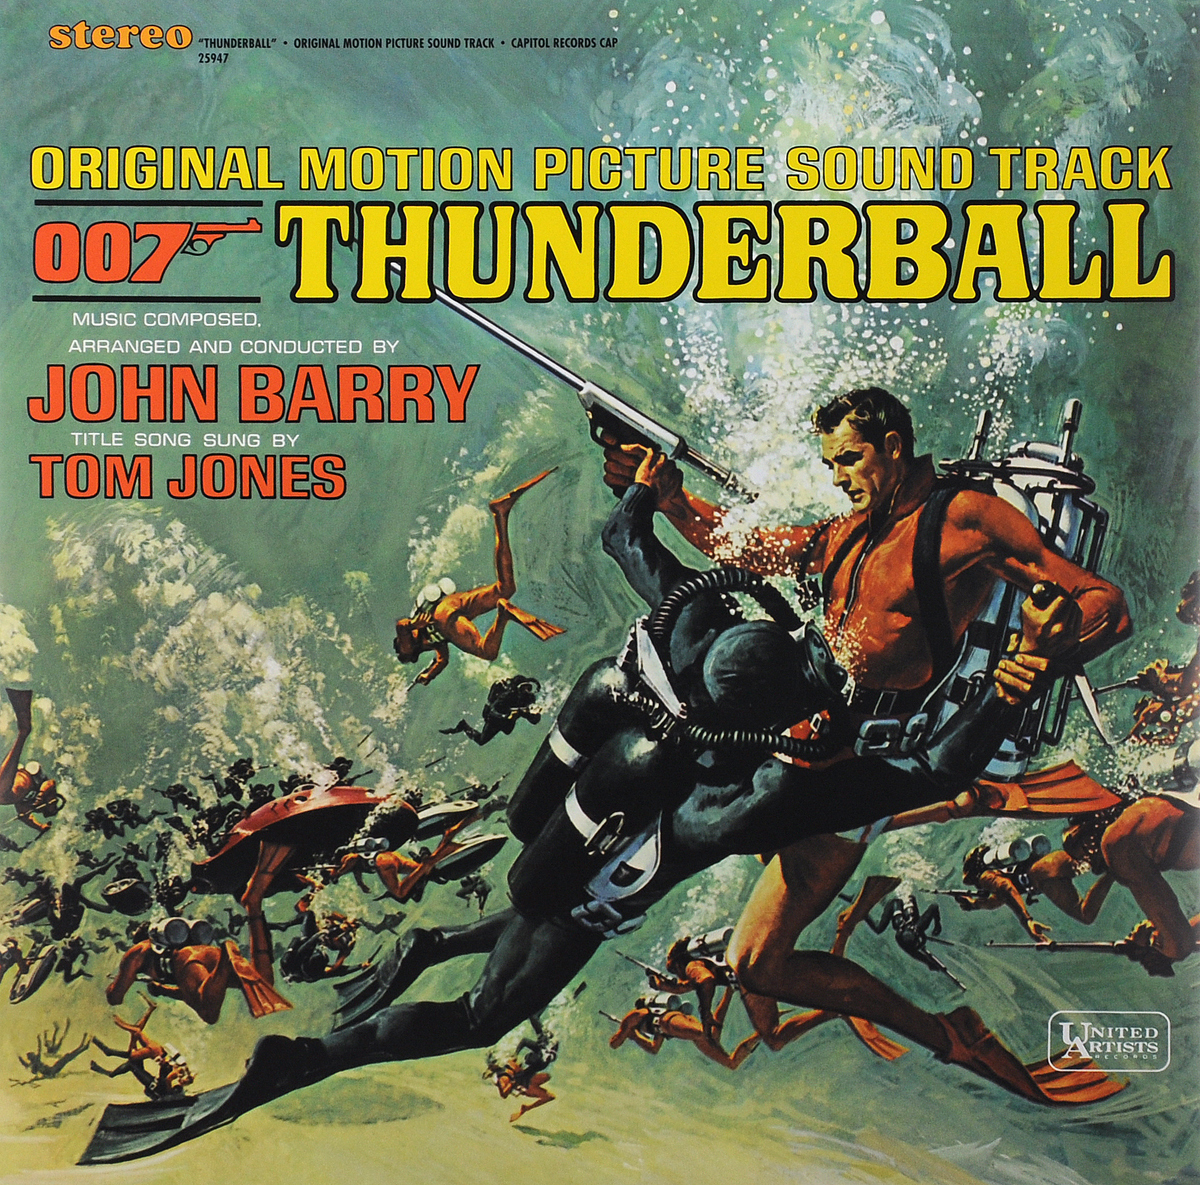 Thunderball. Original Motion Picture Sound Track (LP) palo alto palo alto original motion picture score by devonte hynes lp